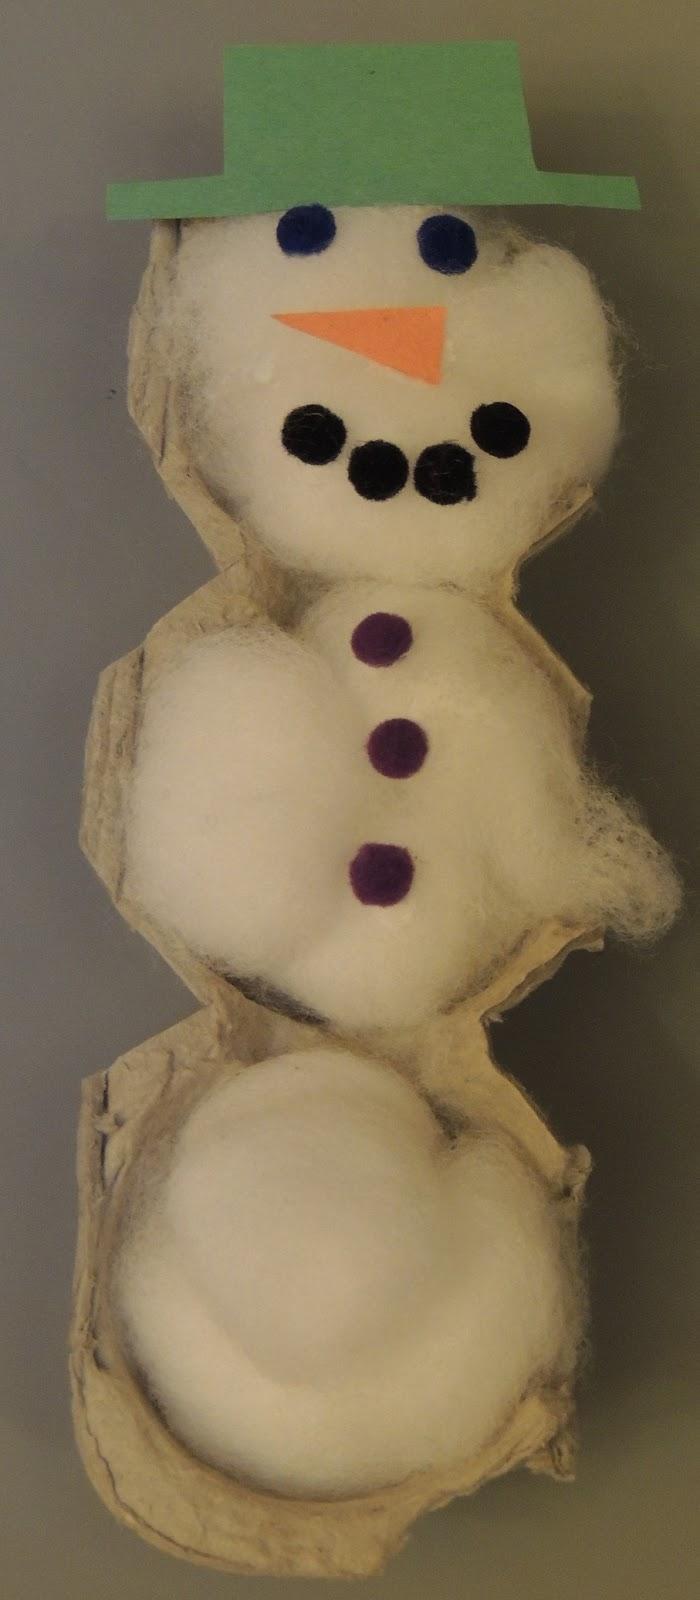 Child care basics resource blog egg carton snowman for Egg carton christmas crafts